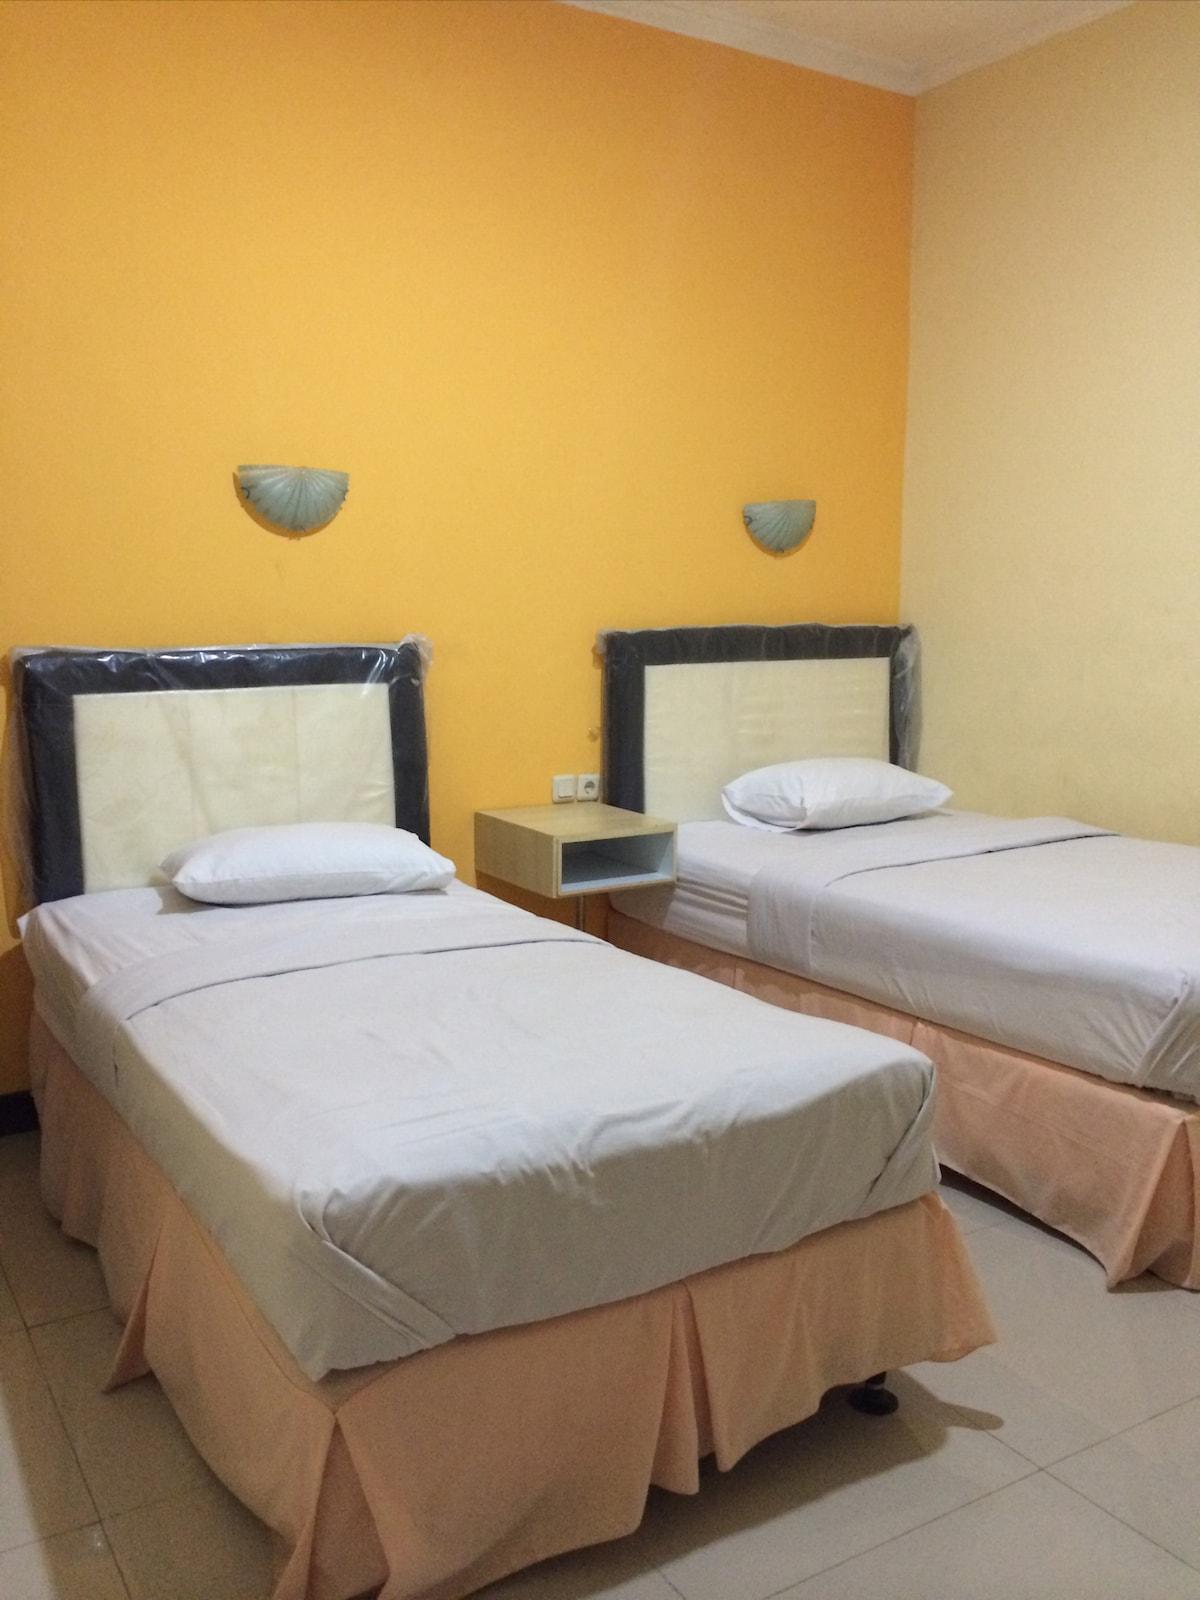 Standard Room in South Surabaya